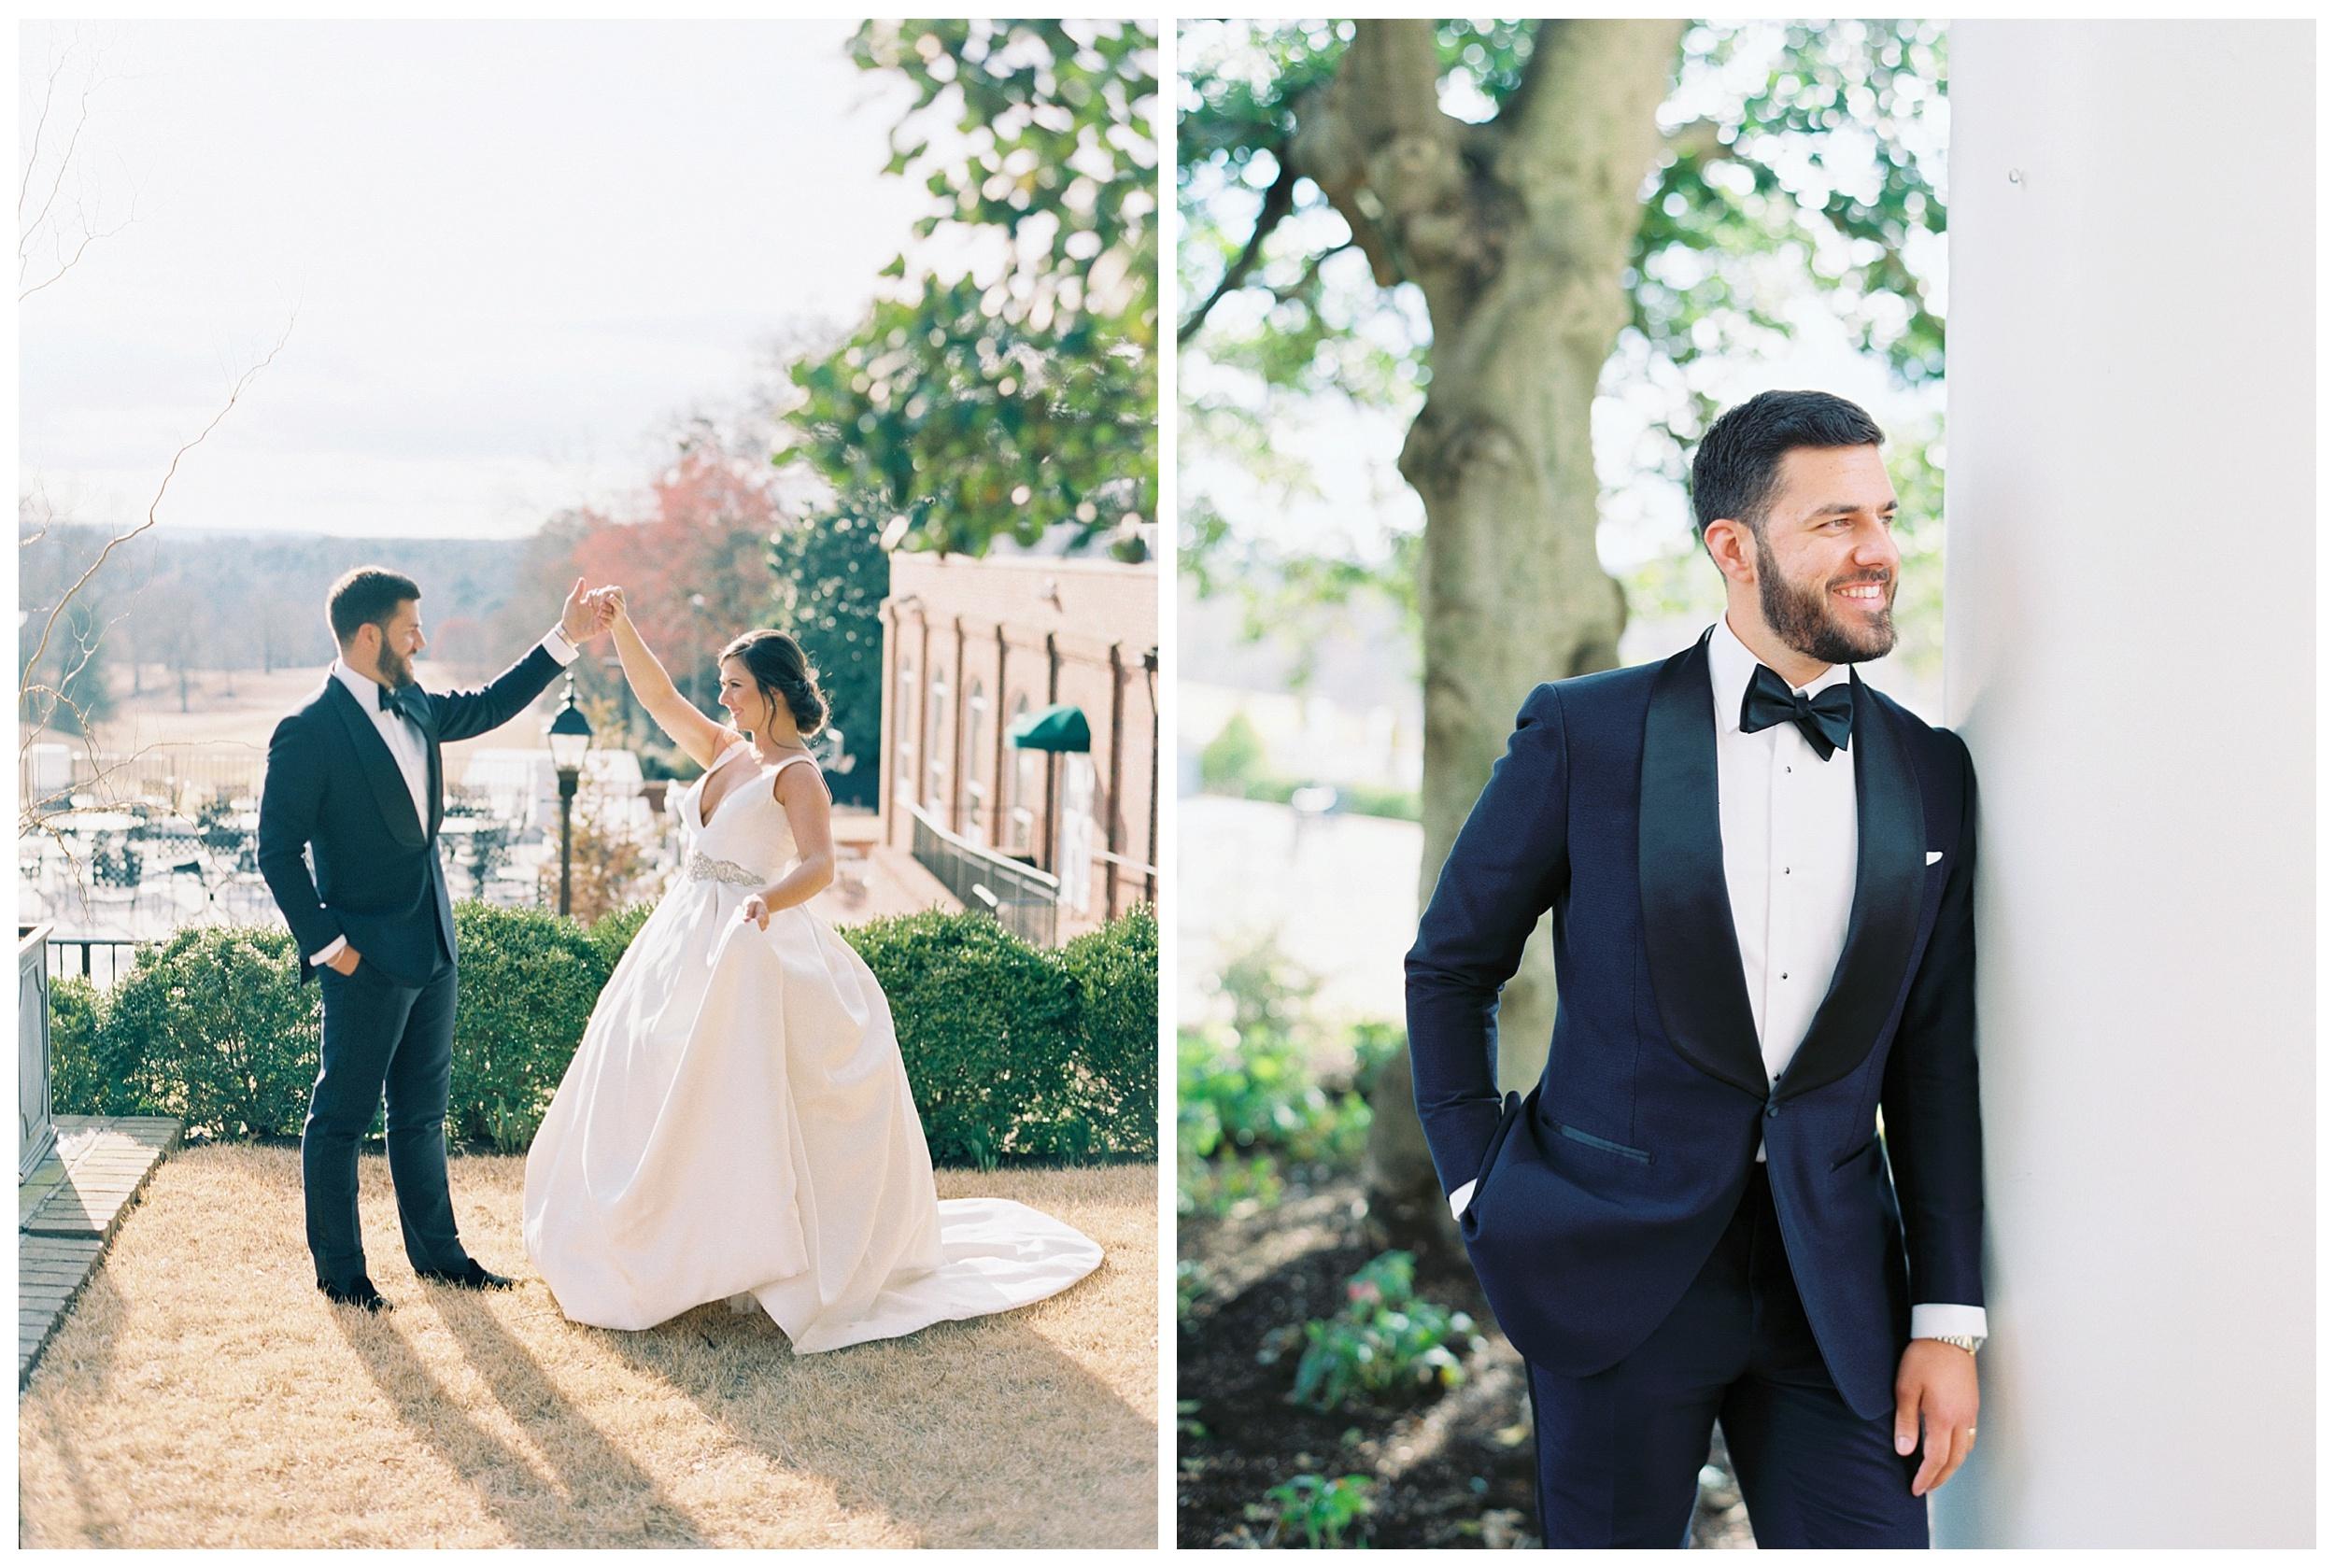 Country Club of Virginia Wedding | Richmond Wedding Photographer_0096.jpg